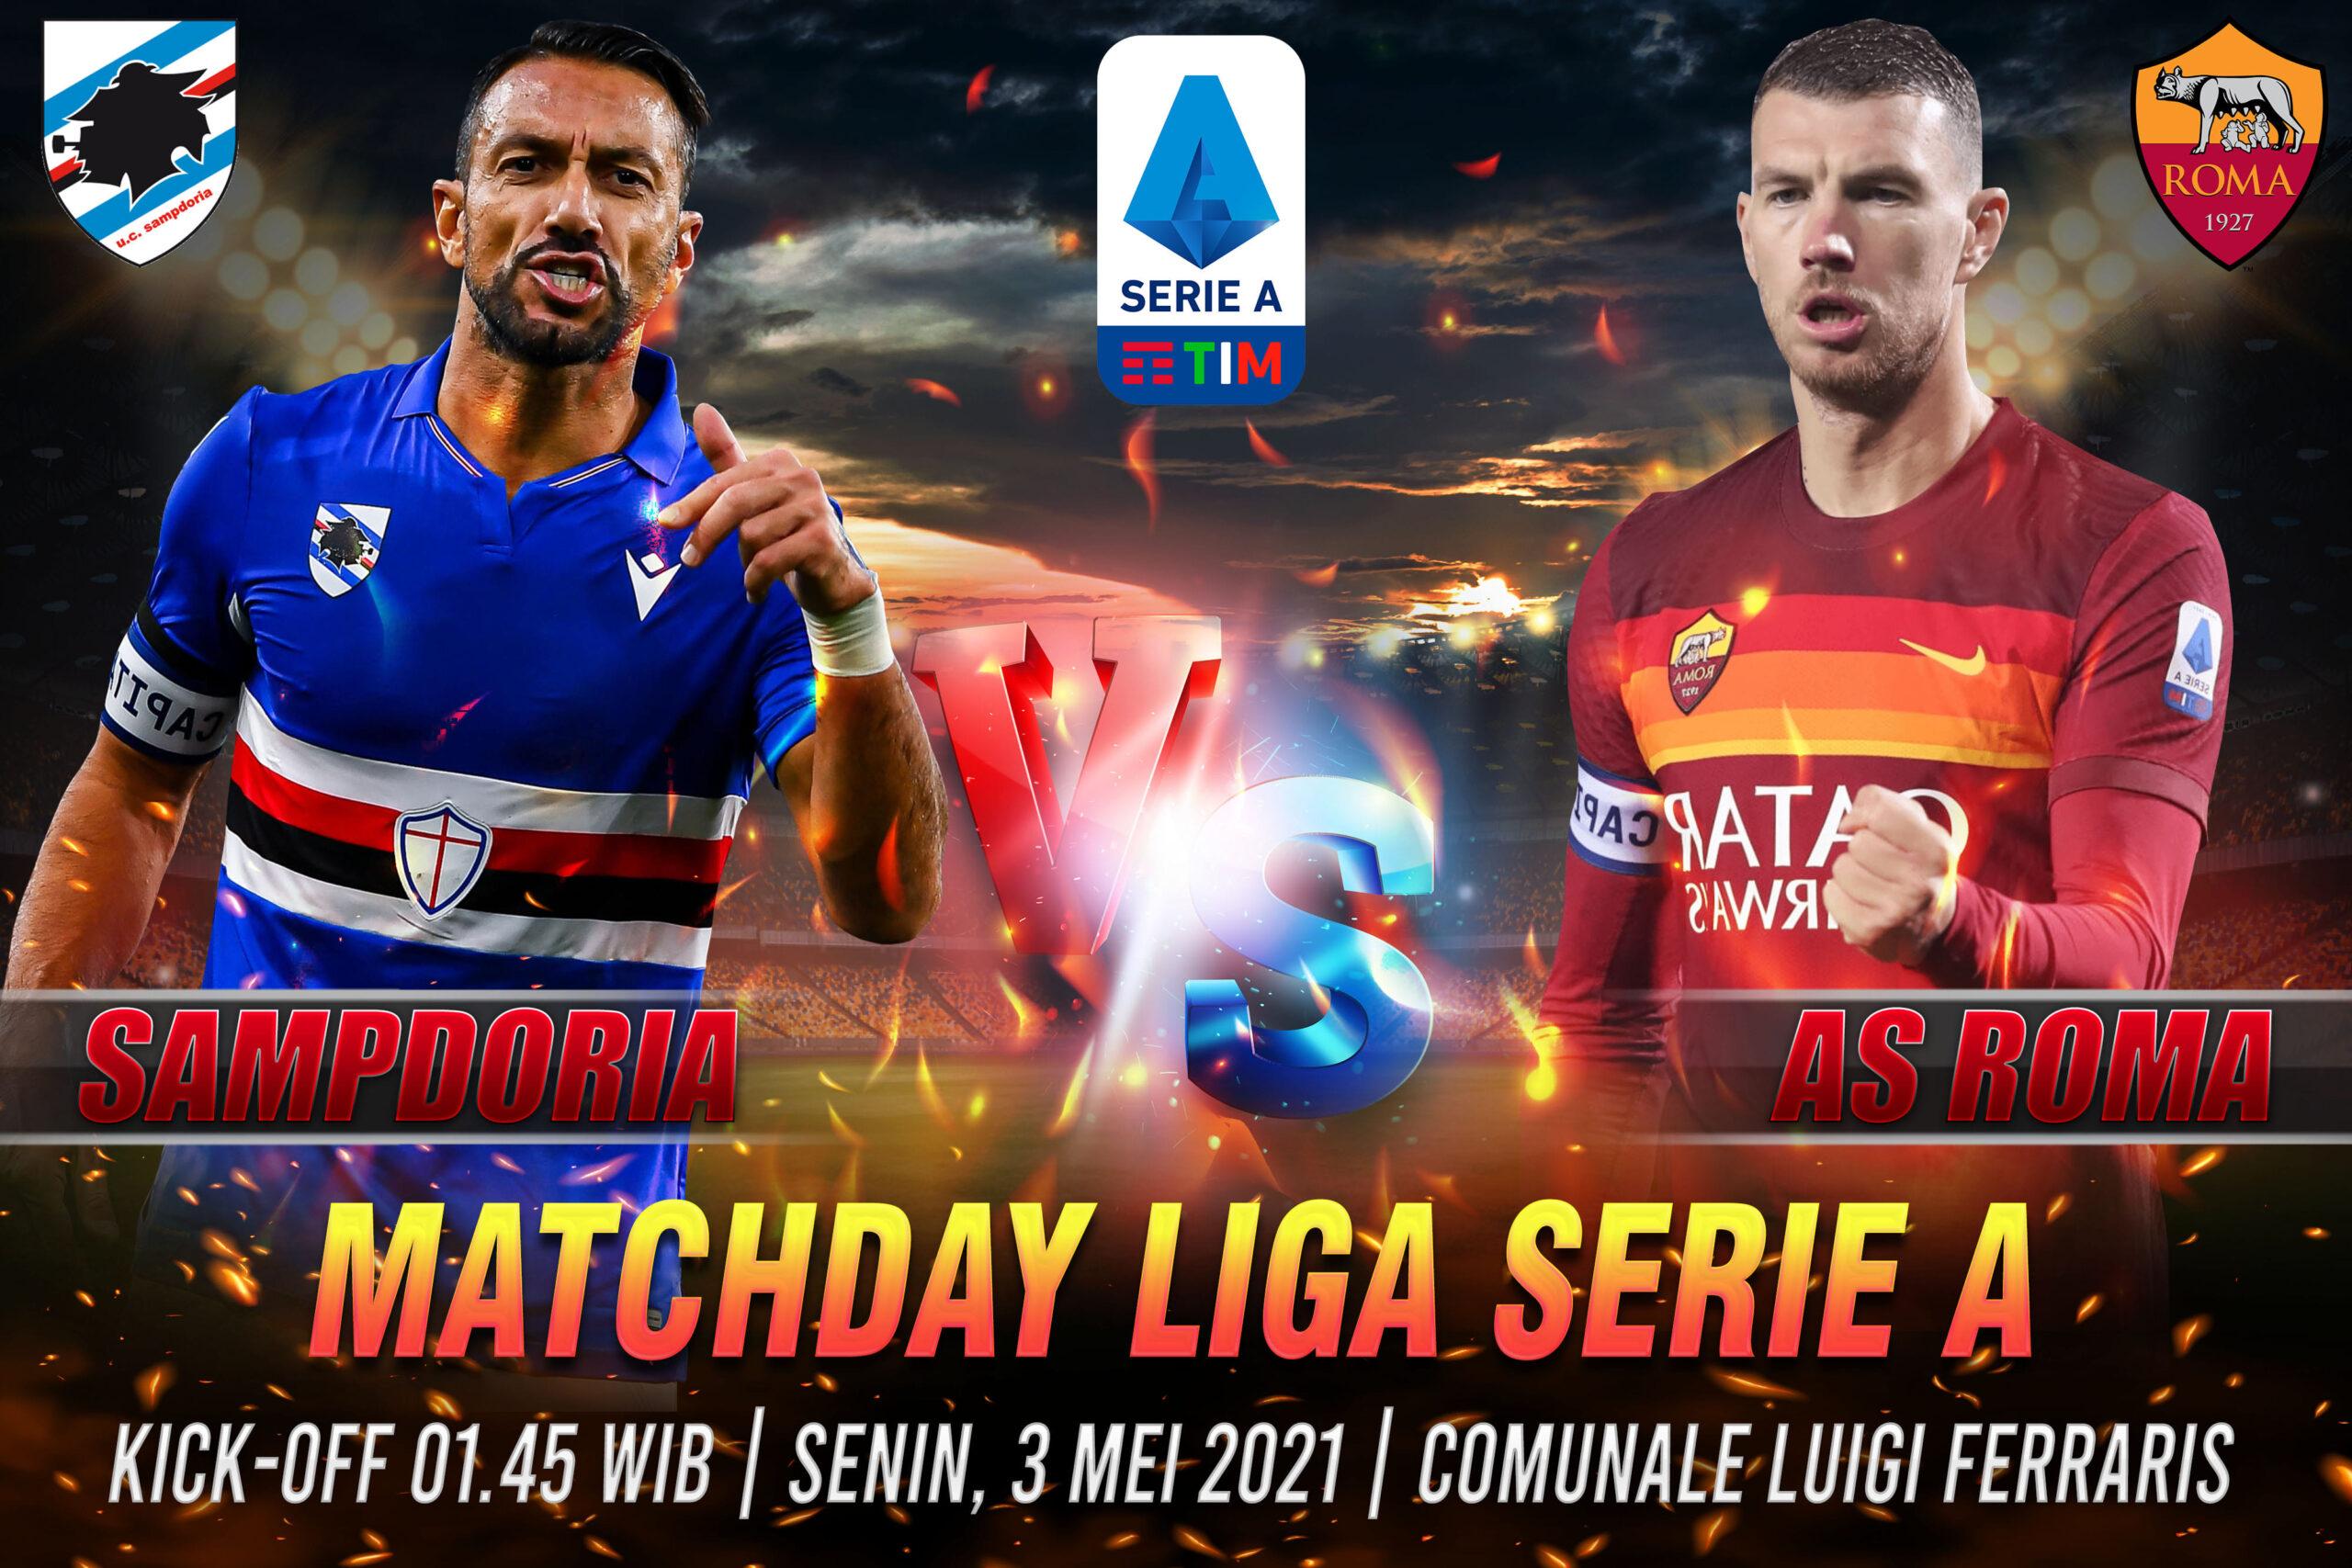 Prediksi Bola Akurat Sampdoria vs AS Roma 3 Mei 2021